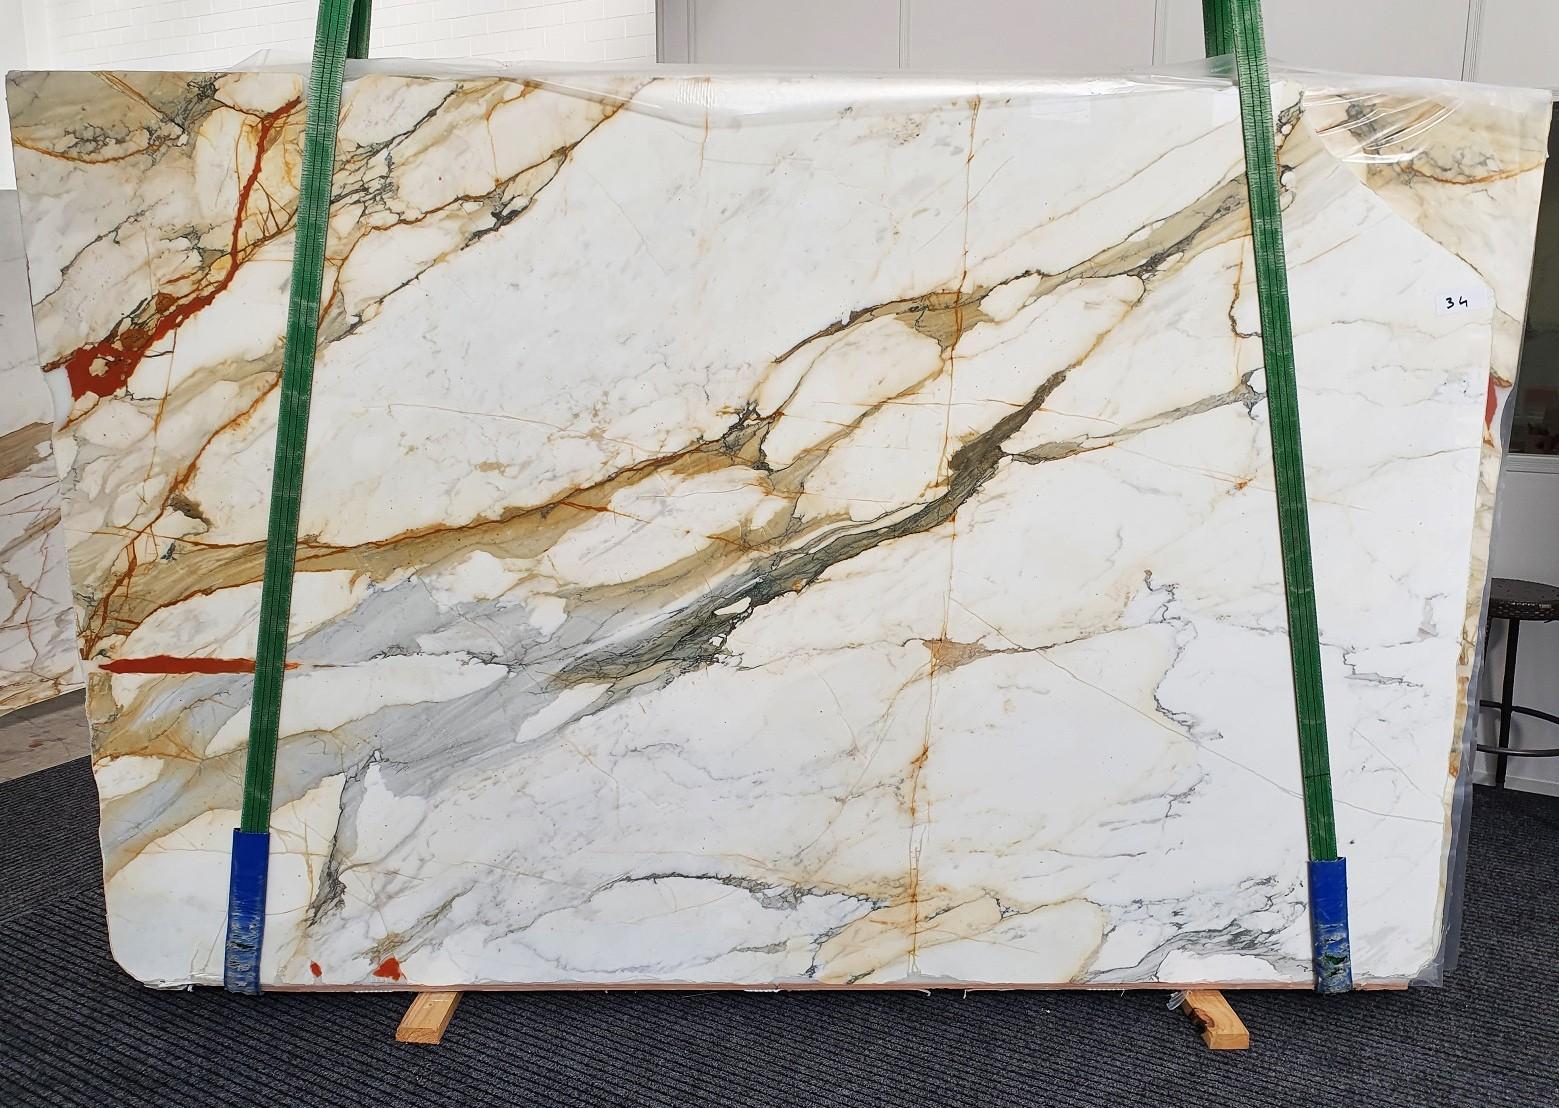 CALACATTA MACCHIAVECCHIA Fourniture Veneto (Italie) d' dalles brillantes en marbre naturel 1422 , Slab #34